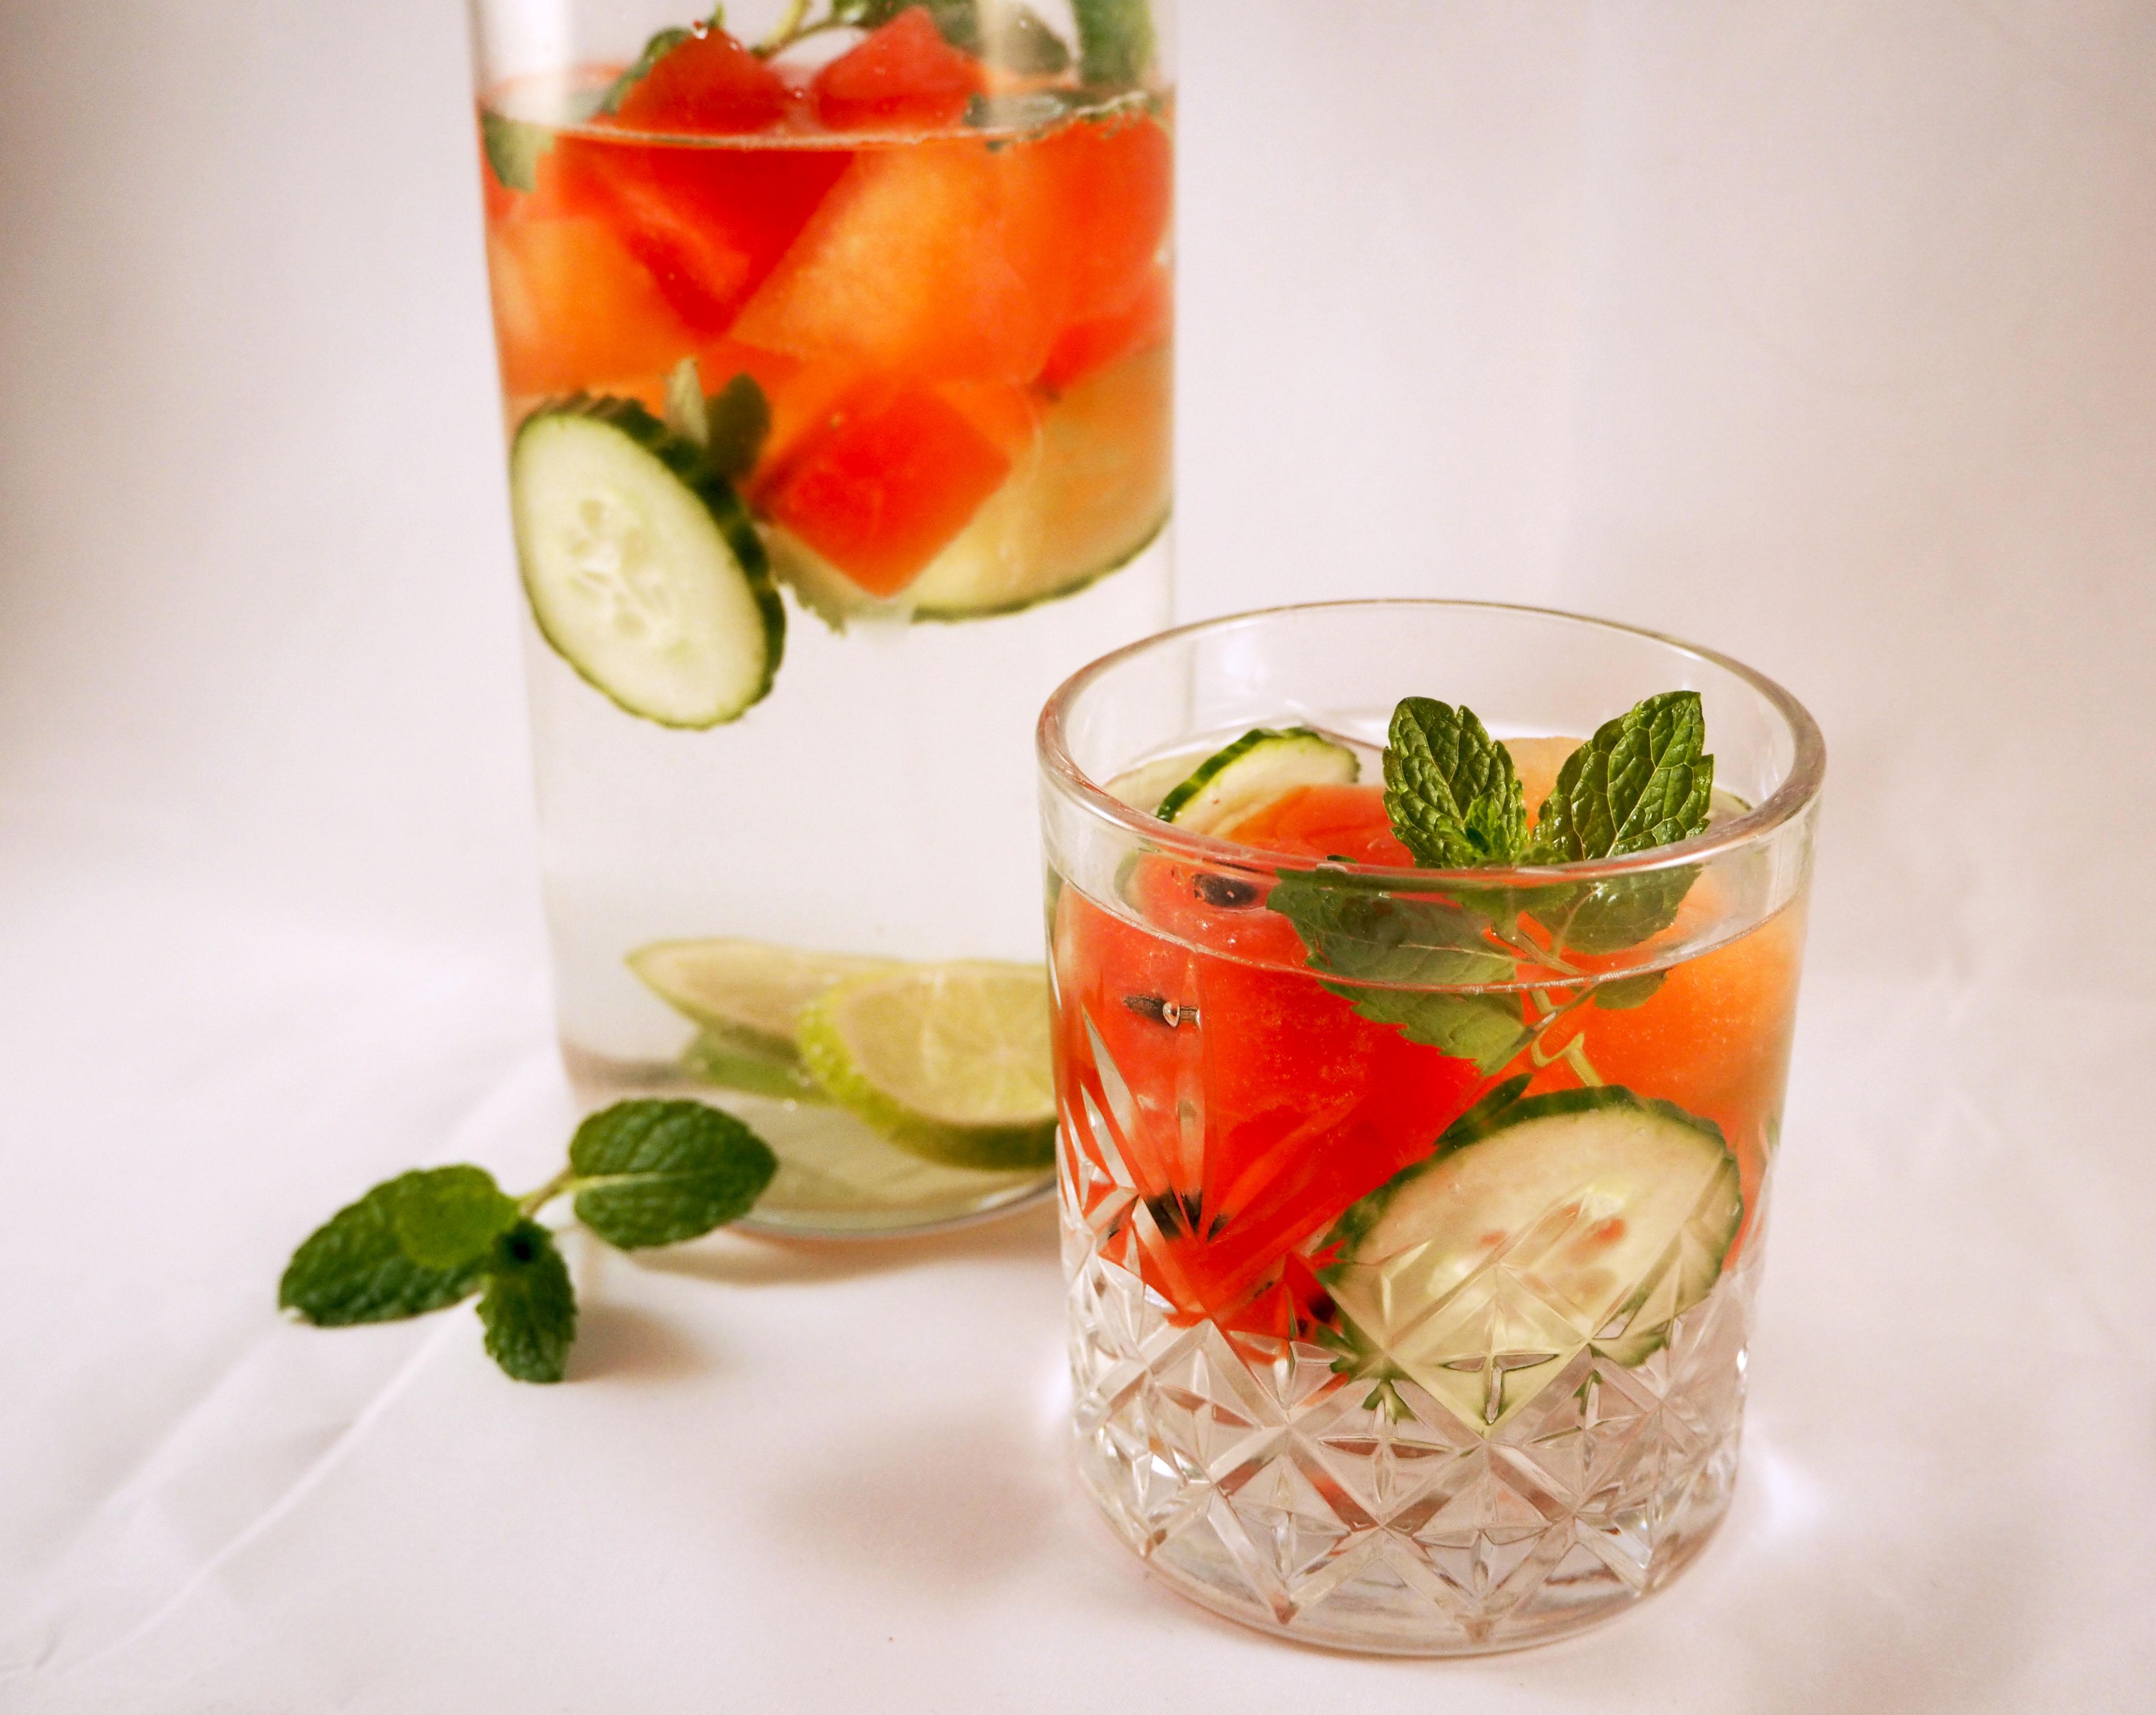 watermeloen met limoen en komkommer in water